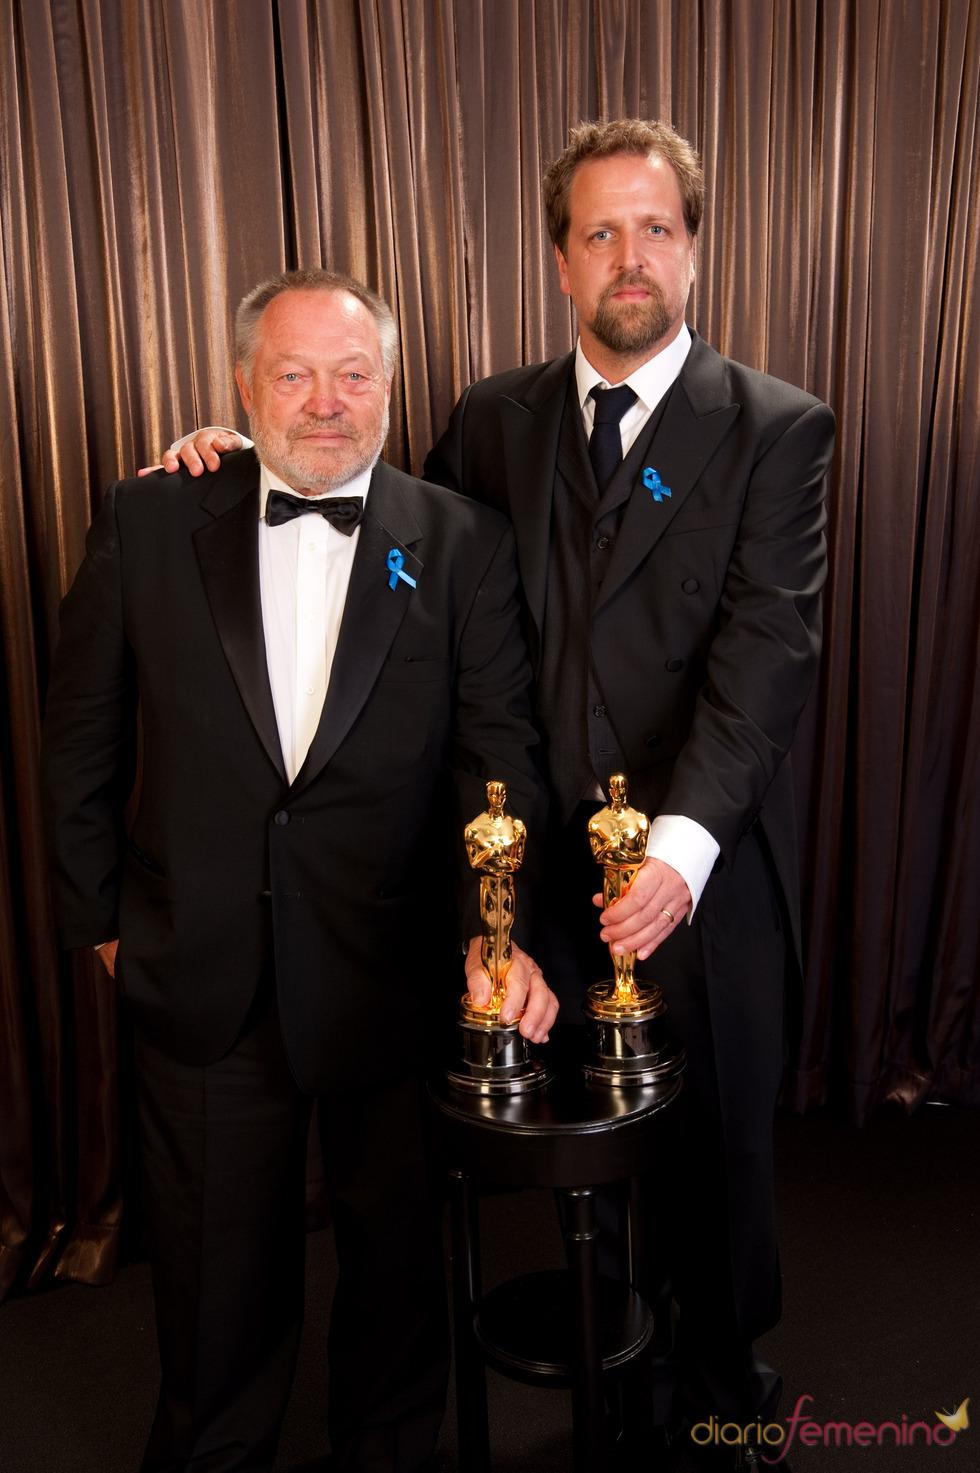 Tivi Magnusson y Joachim Back con su Oscar 2010